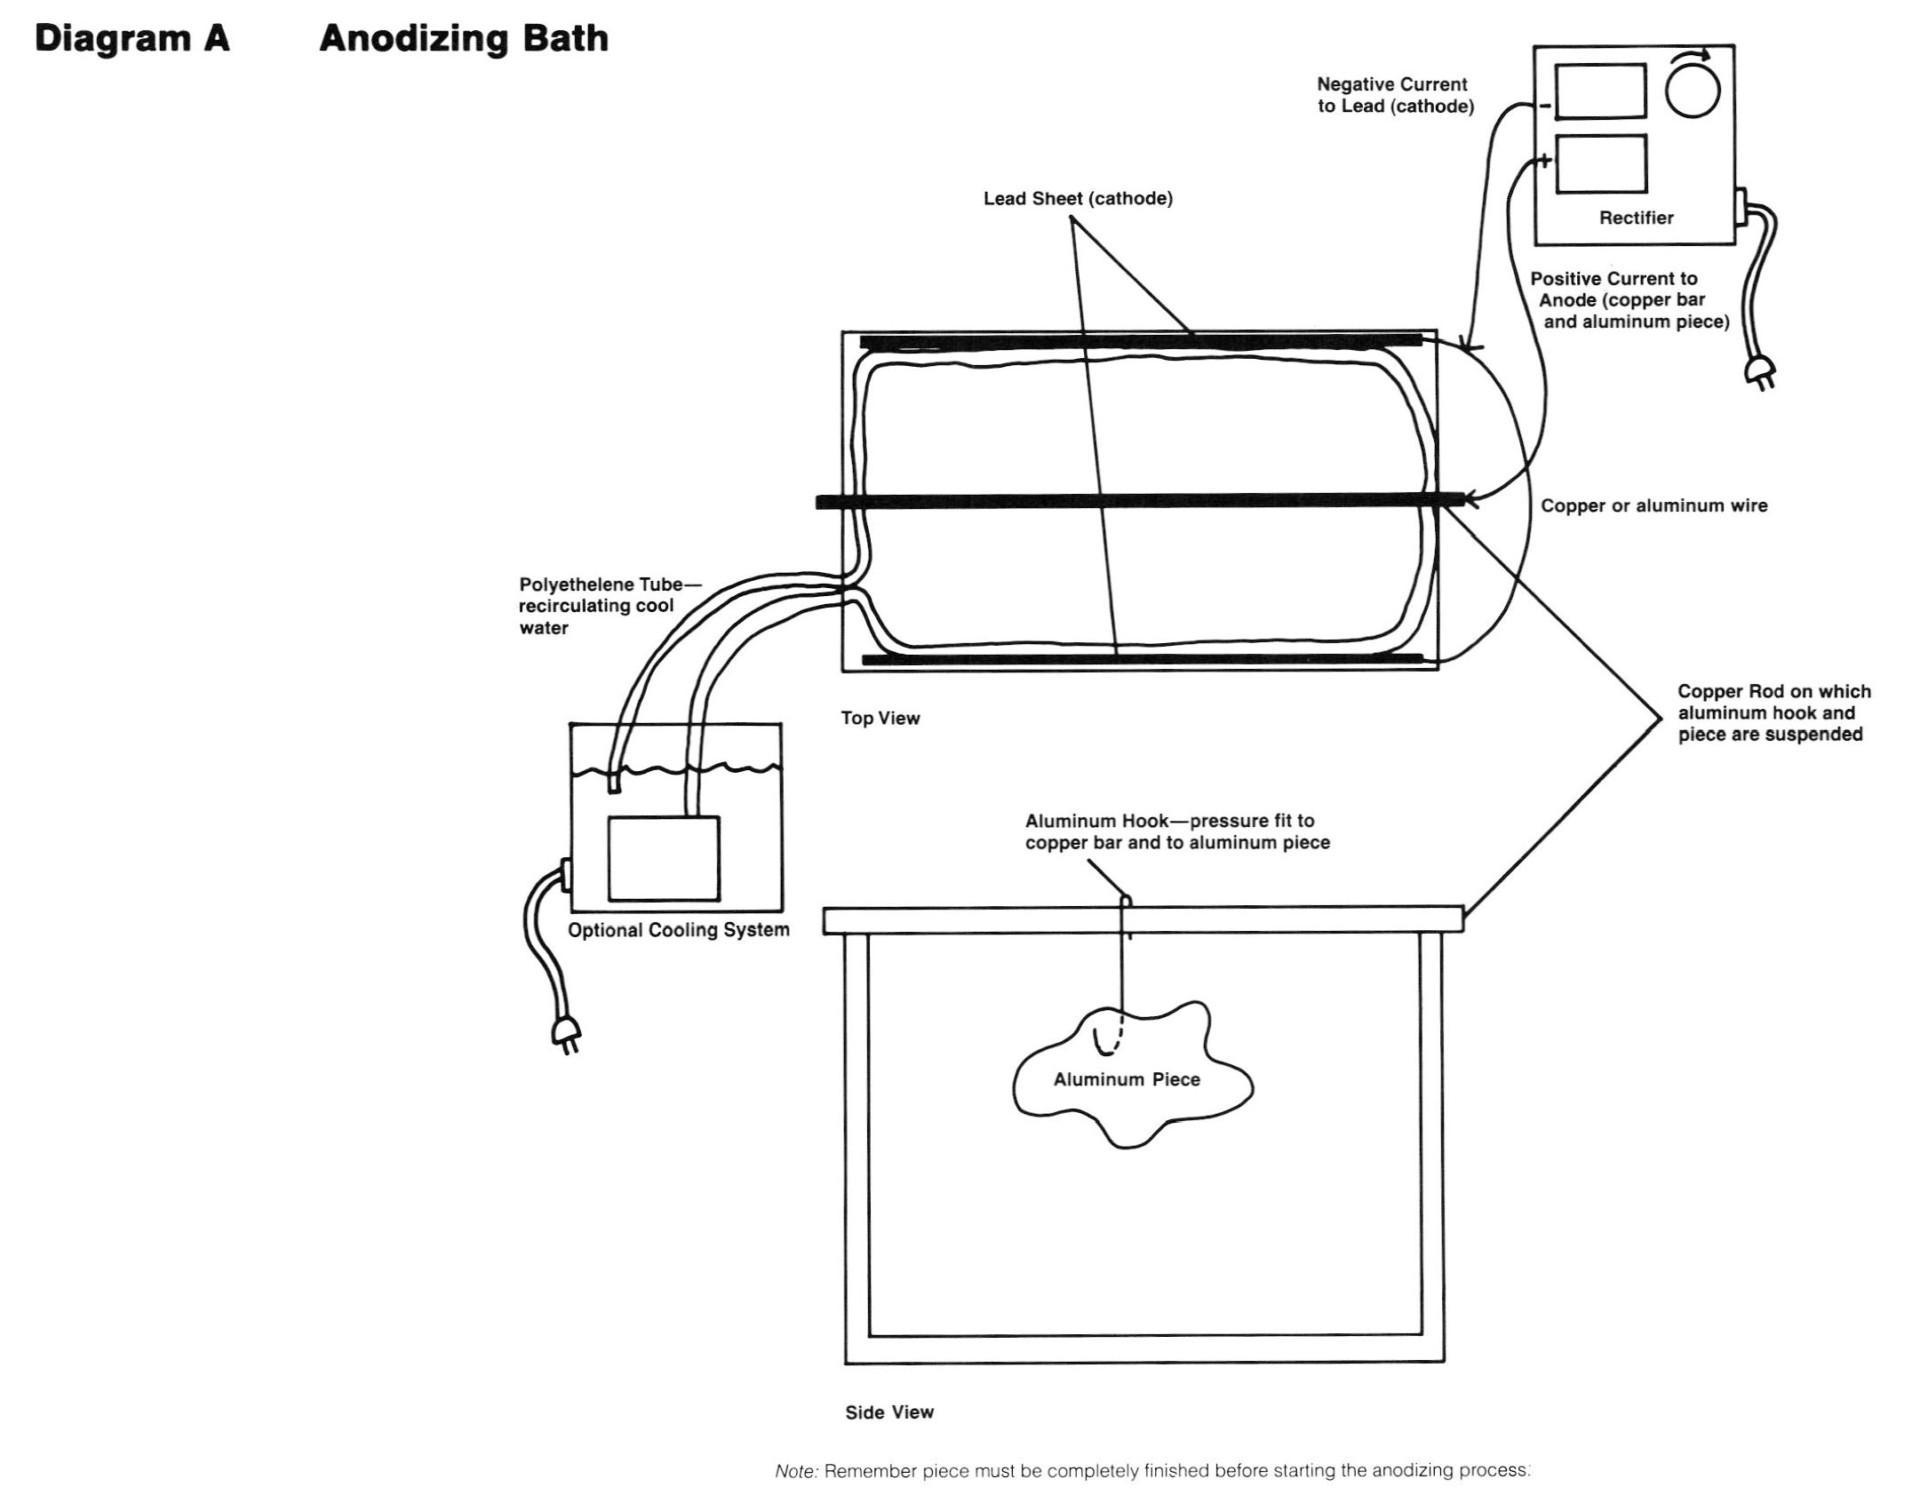 Anodizing Aluminum Ganoksin Jewelry Making Community Wiring Hazards Image 2